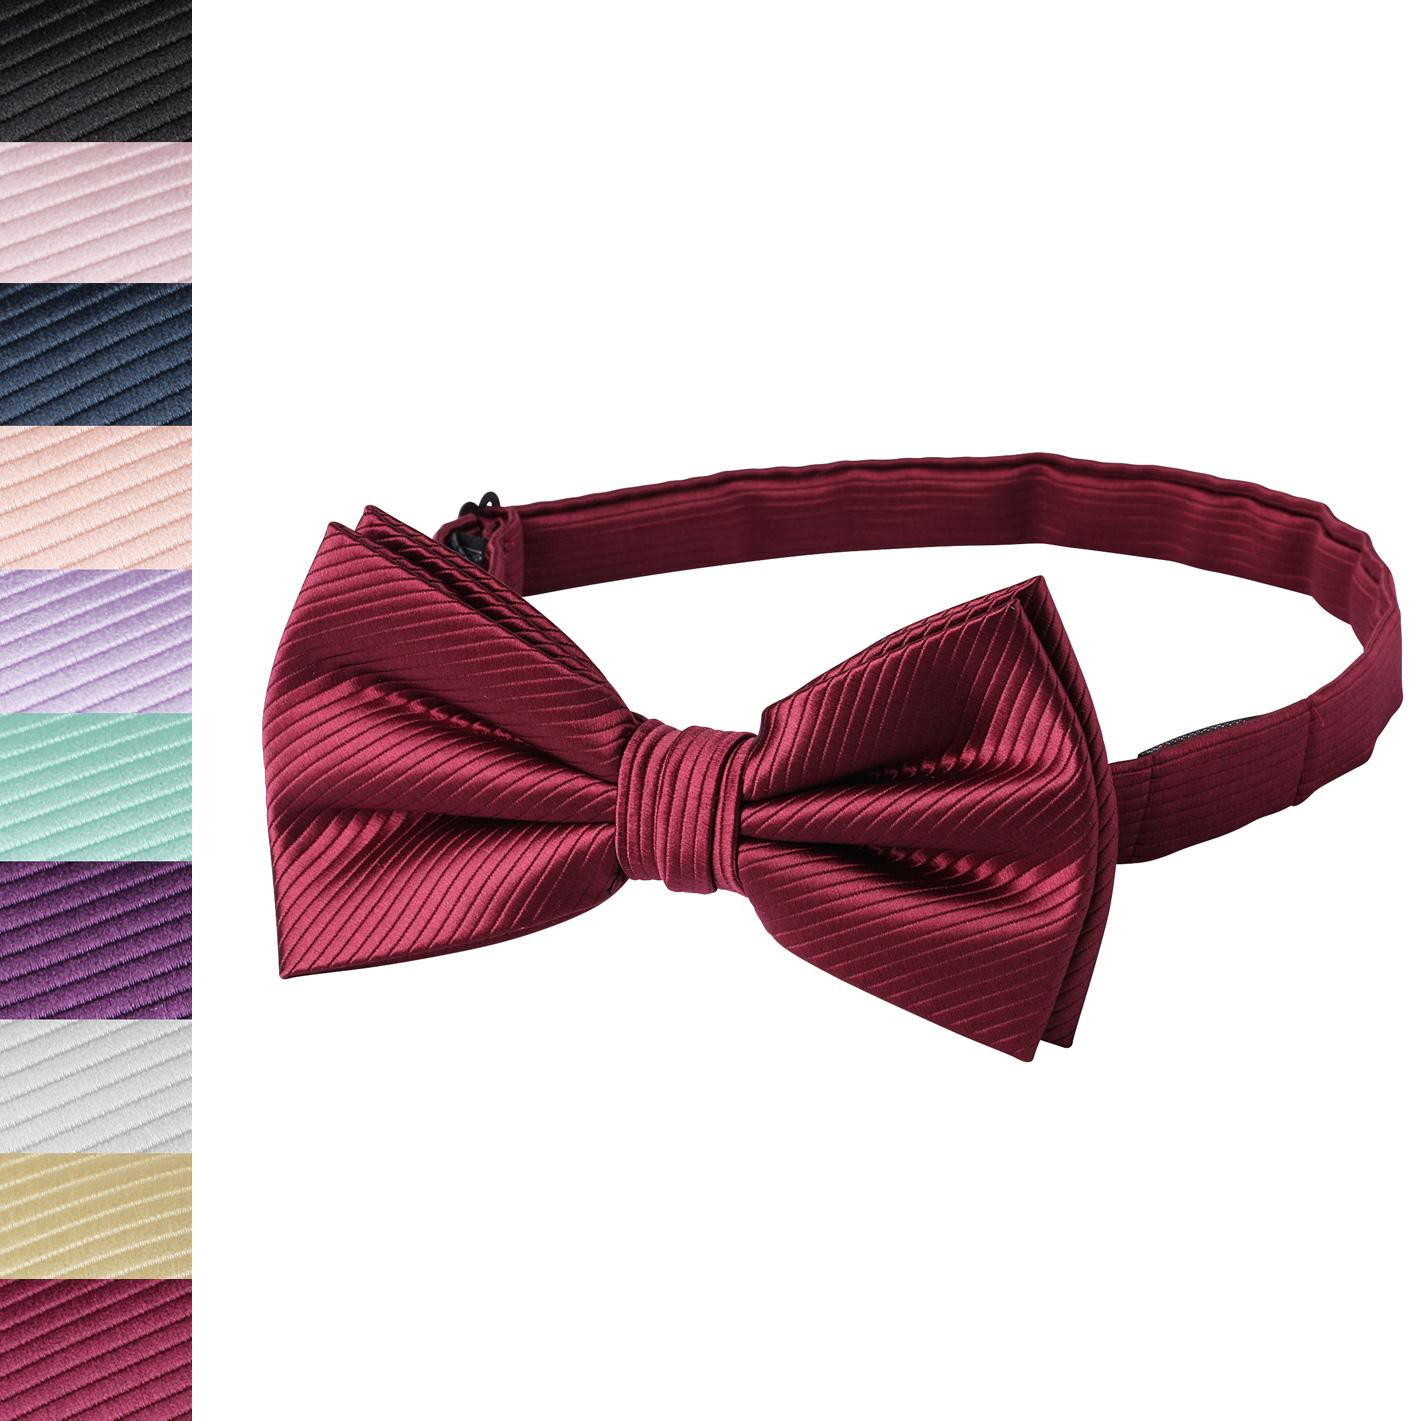 Jacob Alexander Boys 14 Pretied Ready Made Solid Color Zipper Tie Lavender